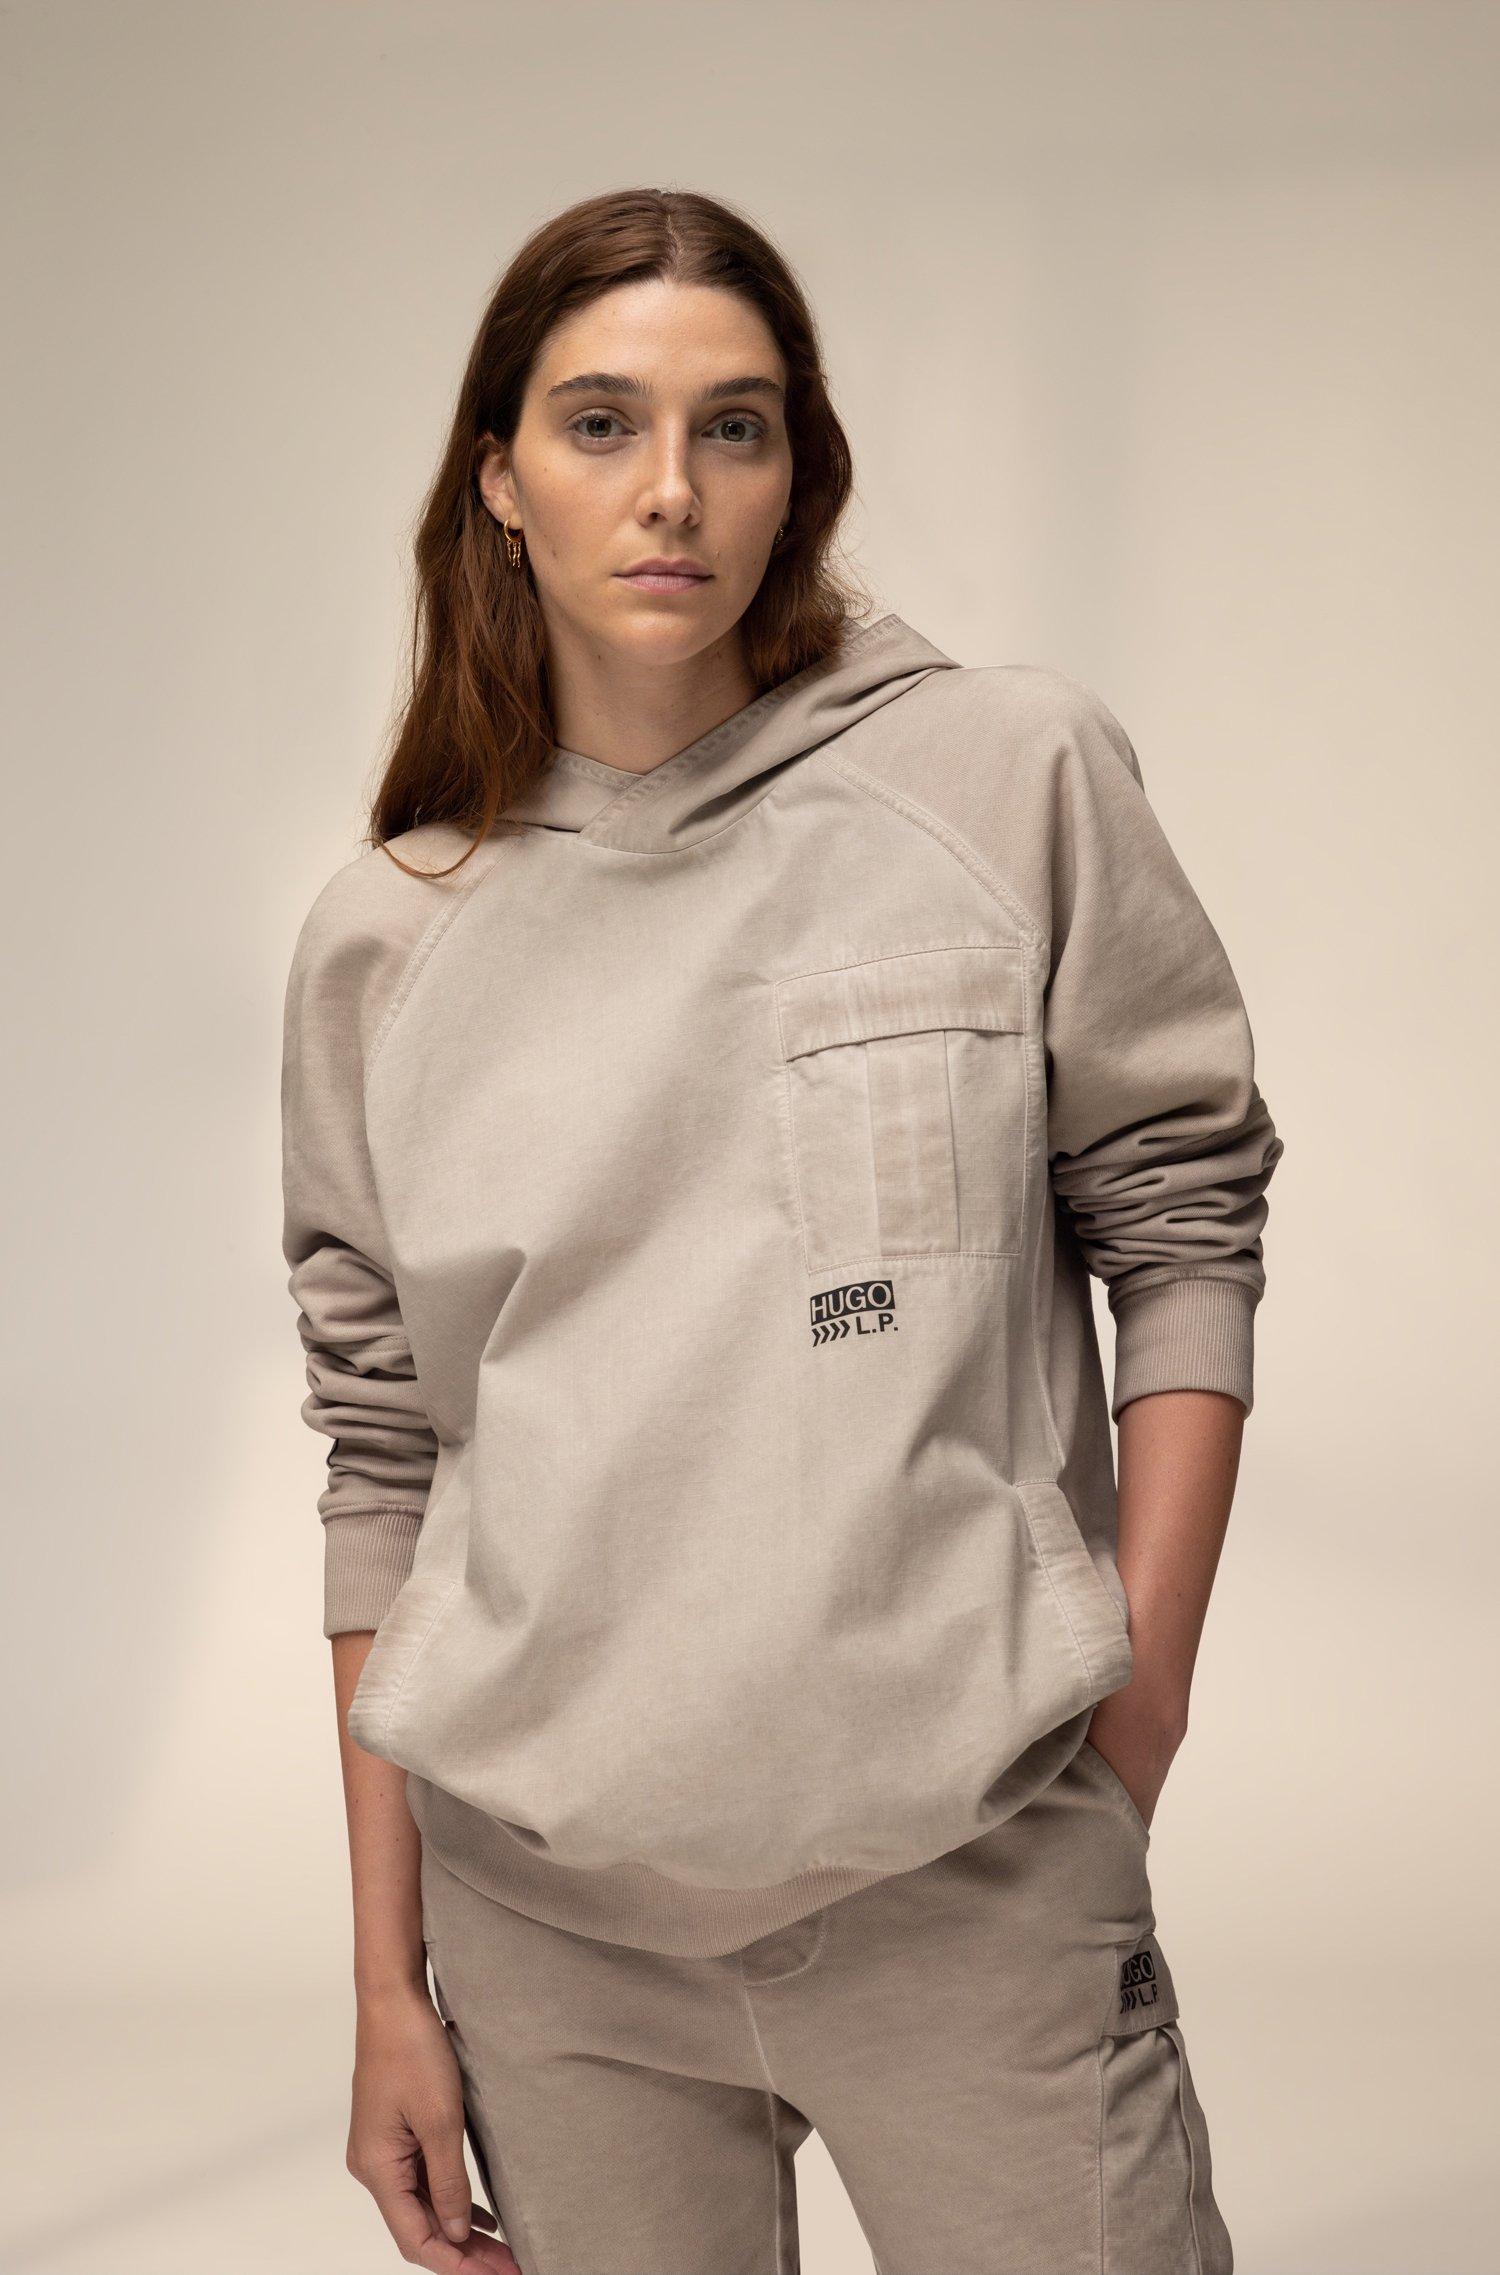 Unisex hooded sweatshirt in cotton with chevron-print logo, Beige